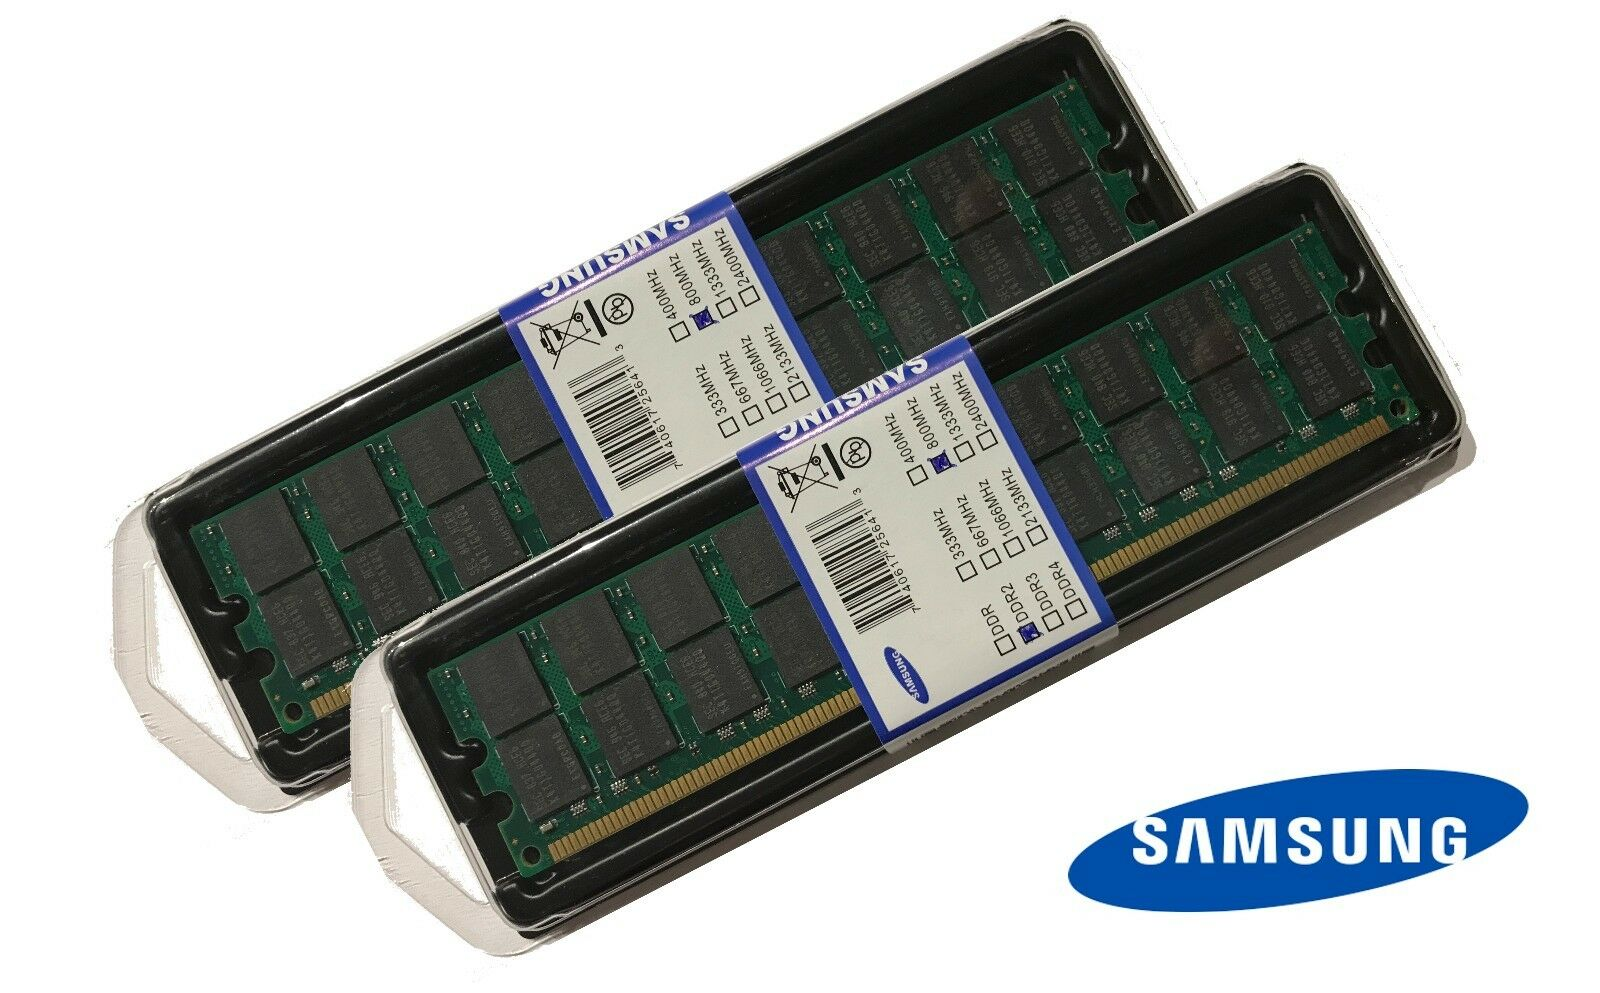 8GB (2 x 4GB) DDR2 RAM PC2-6400 800/667/533 MHz SAMSUNG Arbeitsspeicher AMD